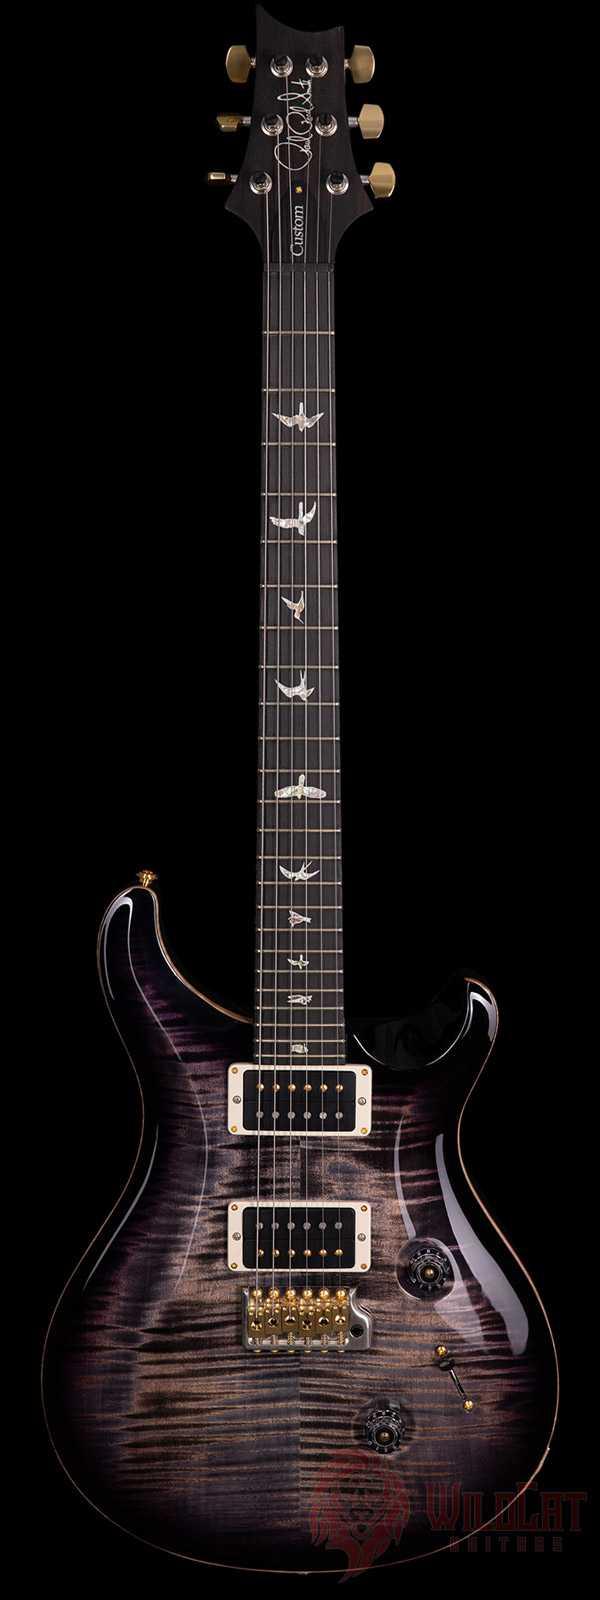 PRS Custom 24 Ten Top Violet Purple Black Burst